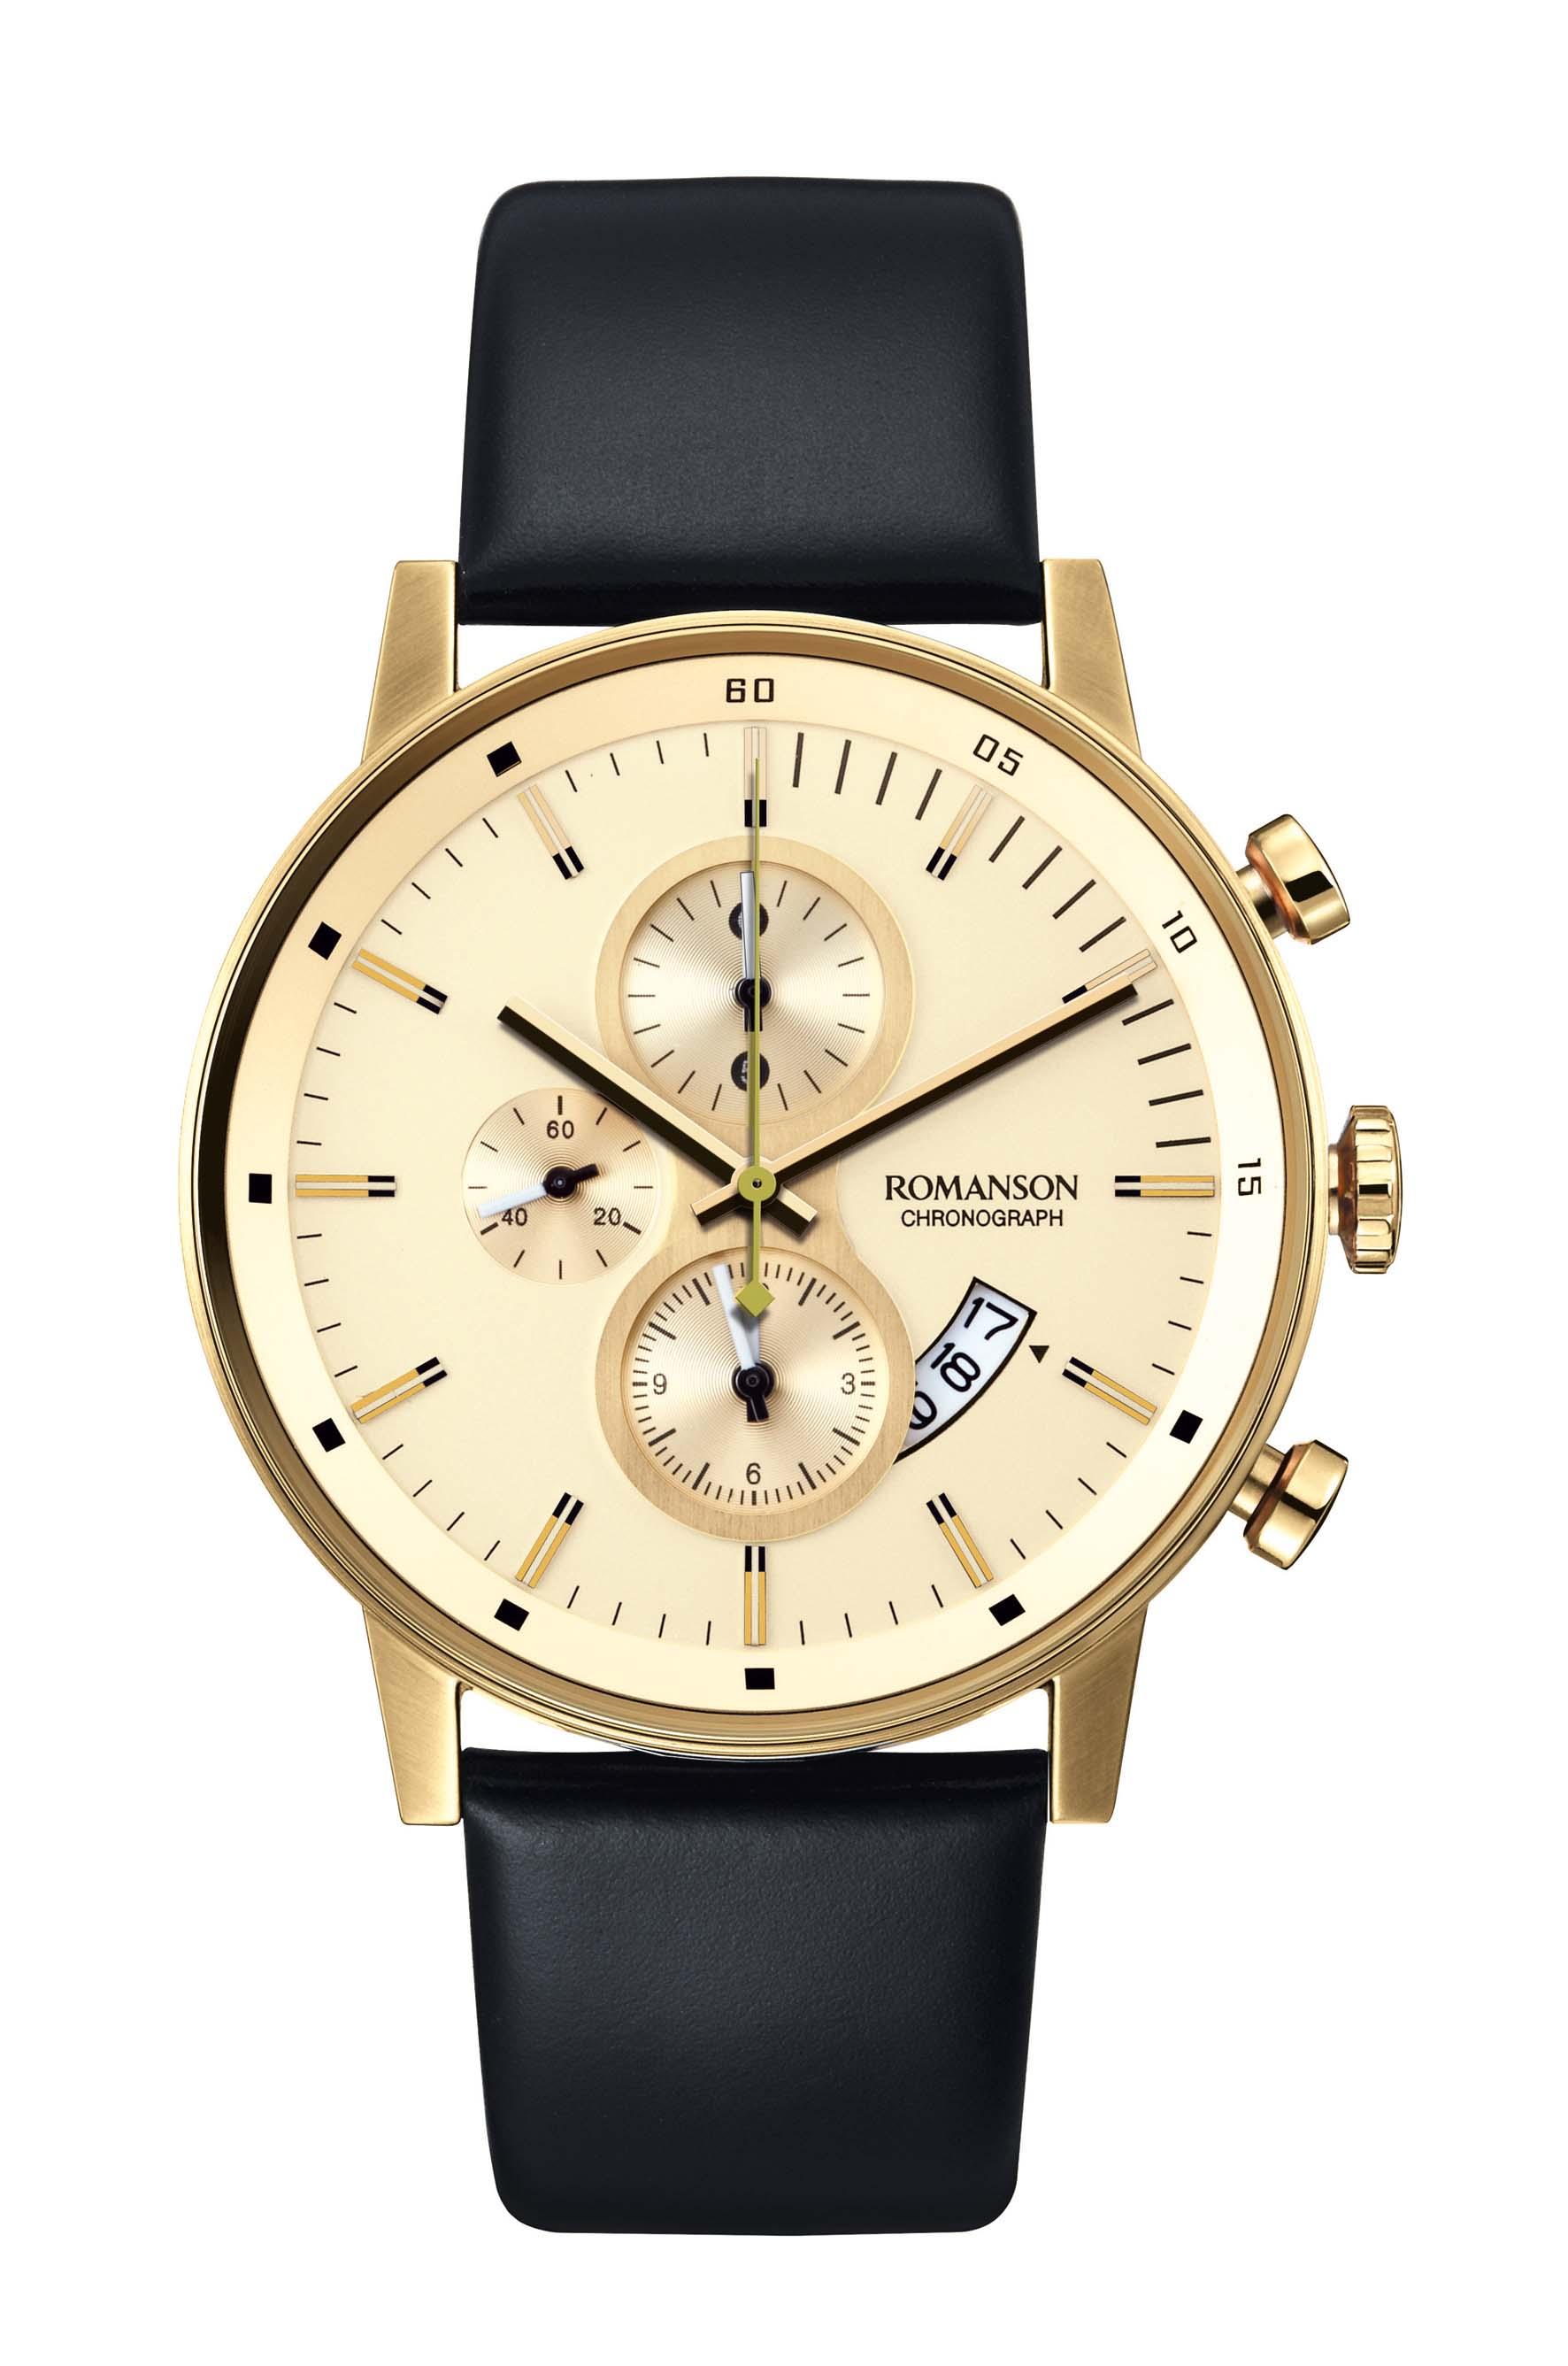 Rozetka.ua Мужские часы Romanson TL8242HMG GD. Цена, купить